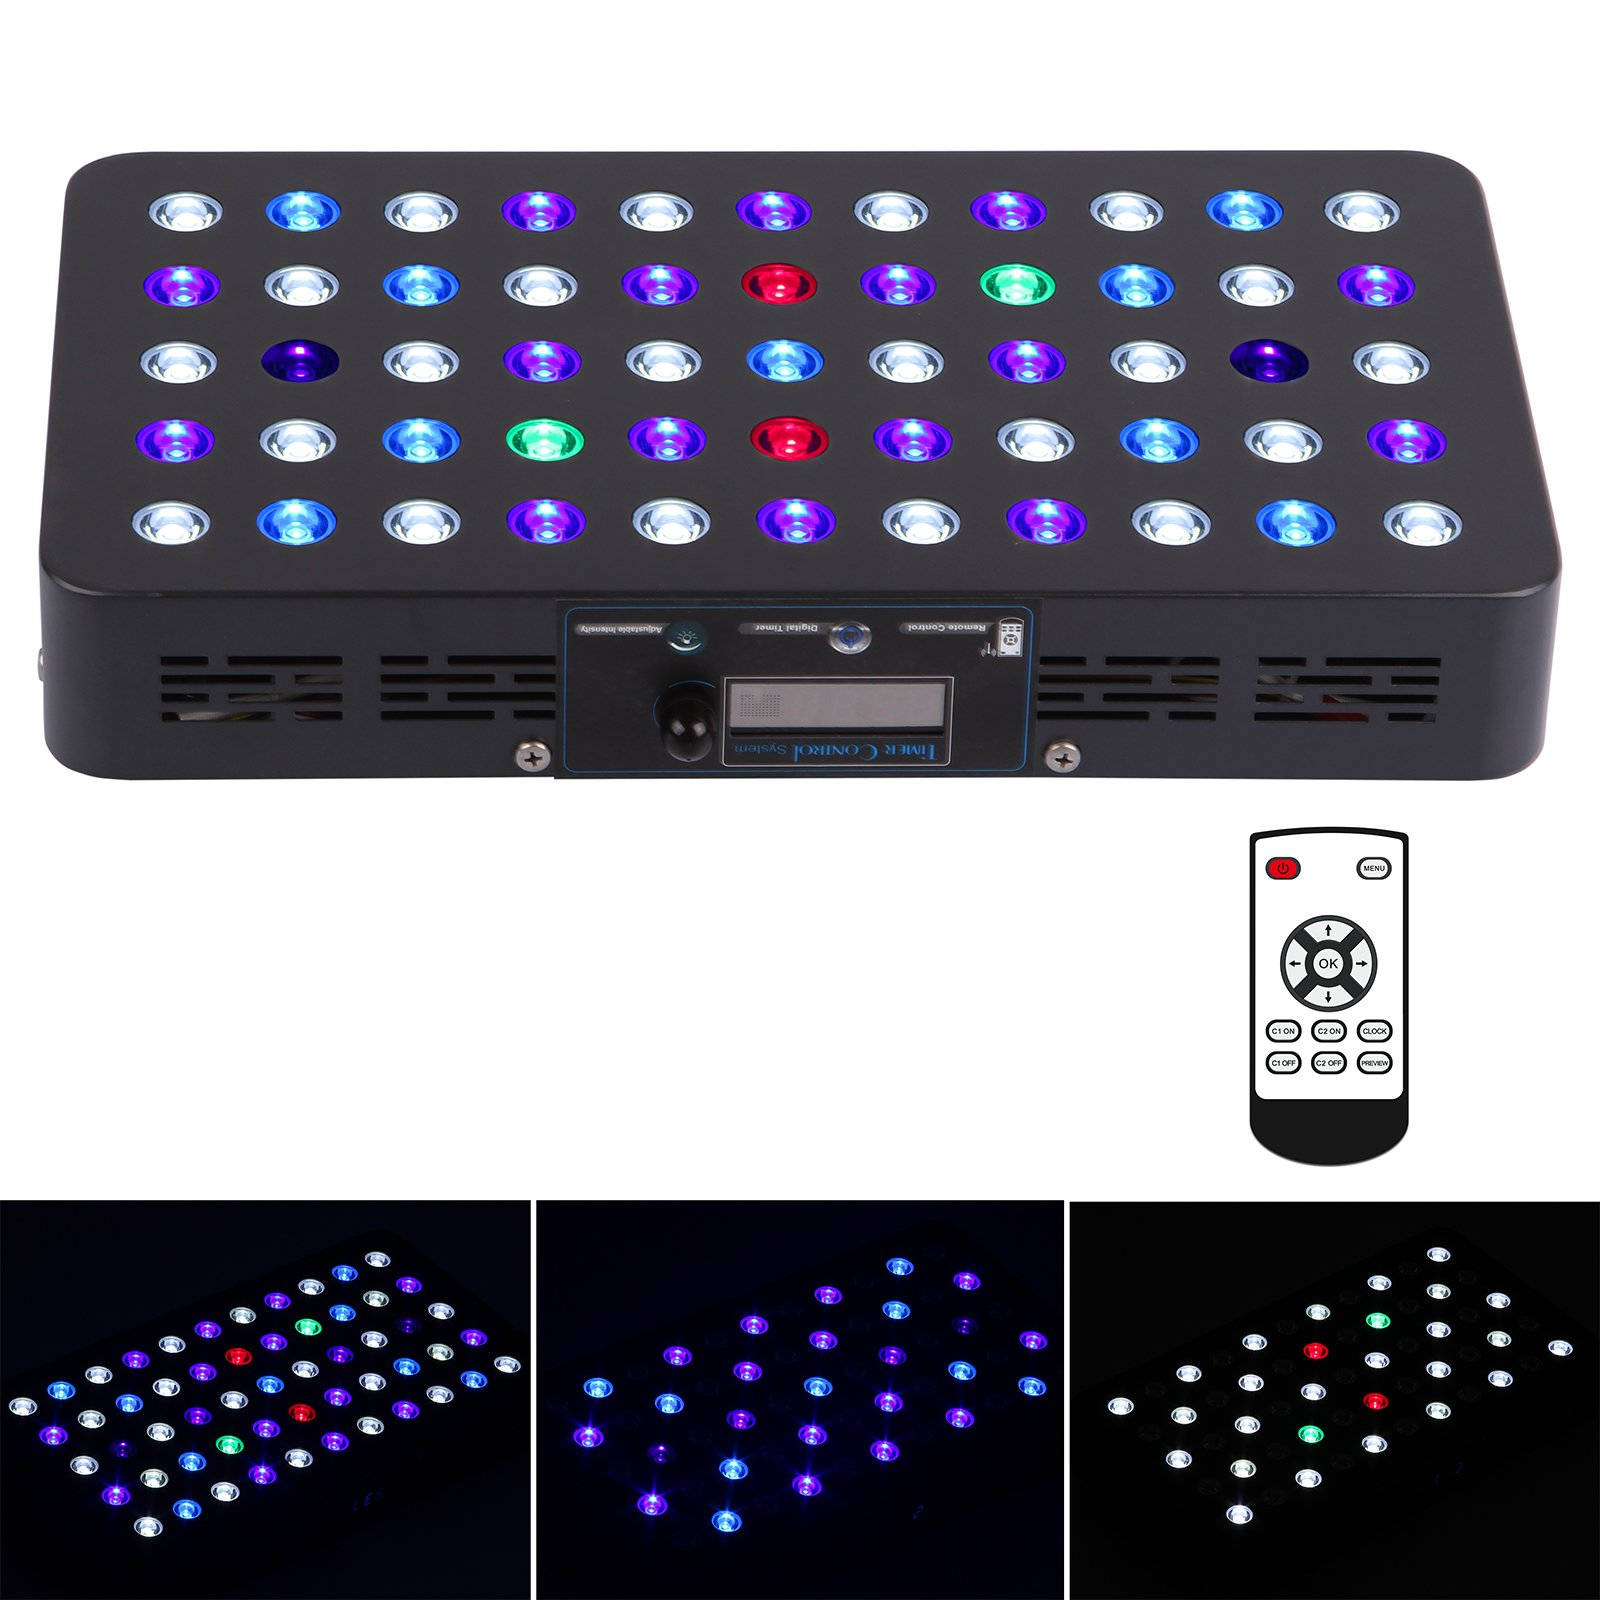 BLOOMSPECT 165W LED Aquarium Light Timer Control Full Spectrum CoralReef SPS/LPS